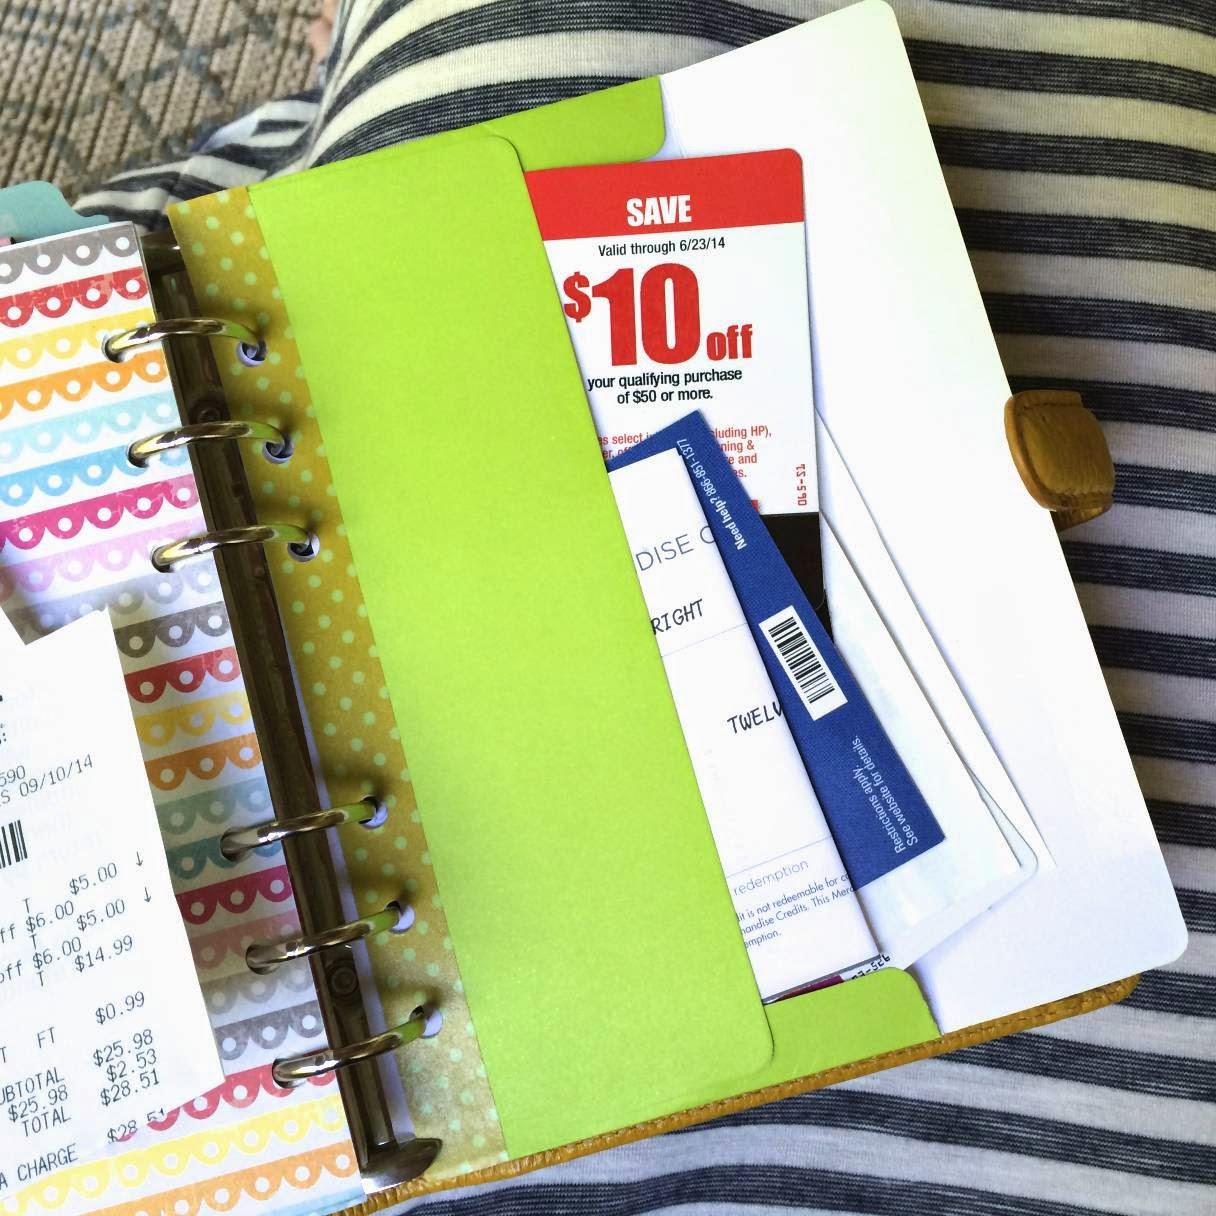 Coupon Organization in your Filofax Planner | iloveitallwithmonikawright.com